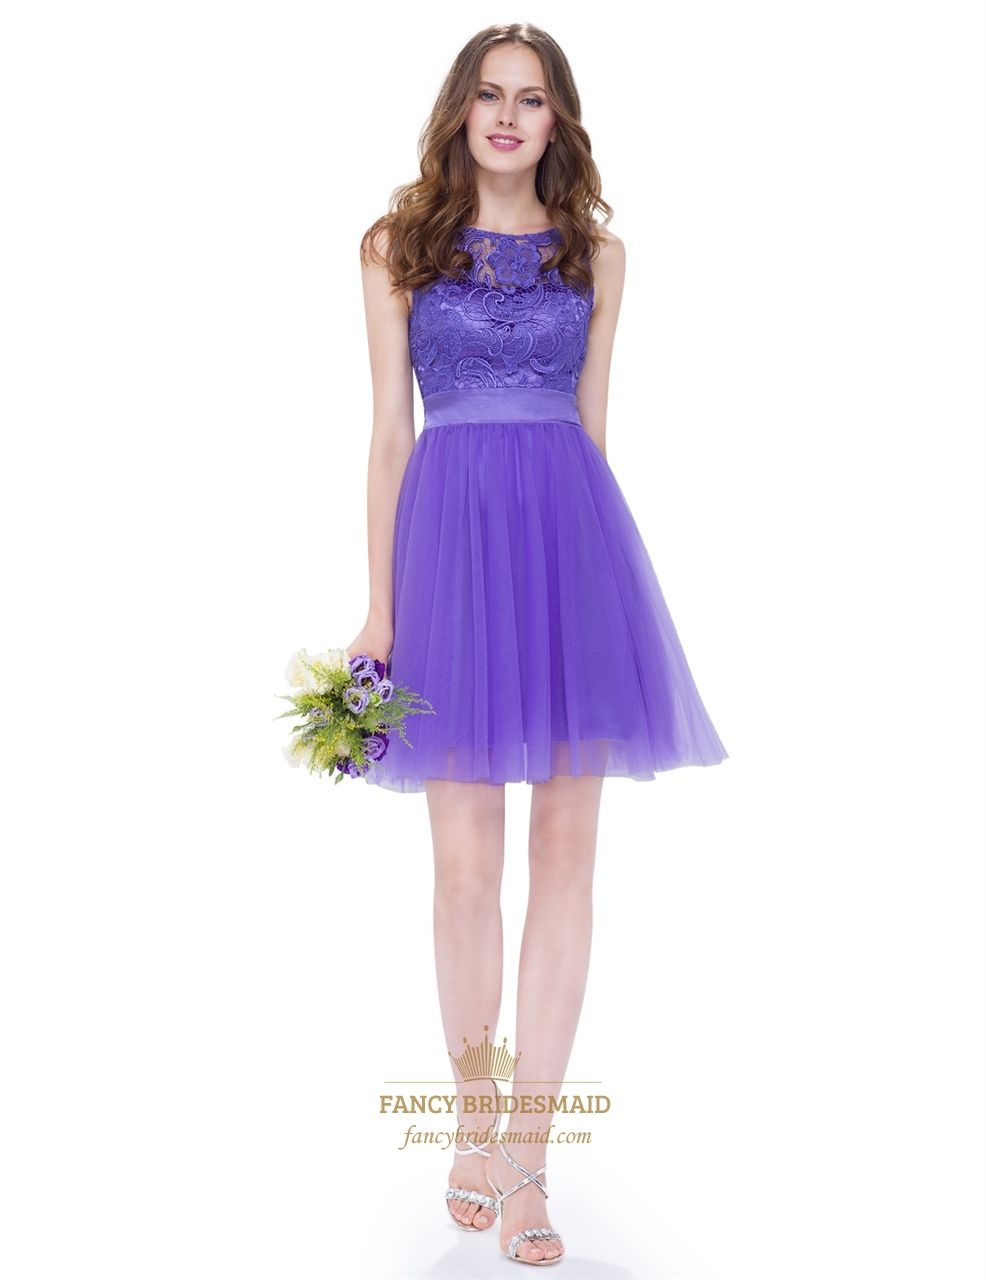 Sheer Lace Top Chiffon Skirt Embellished Waist Short Cocktail Dress ...